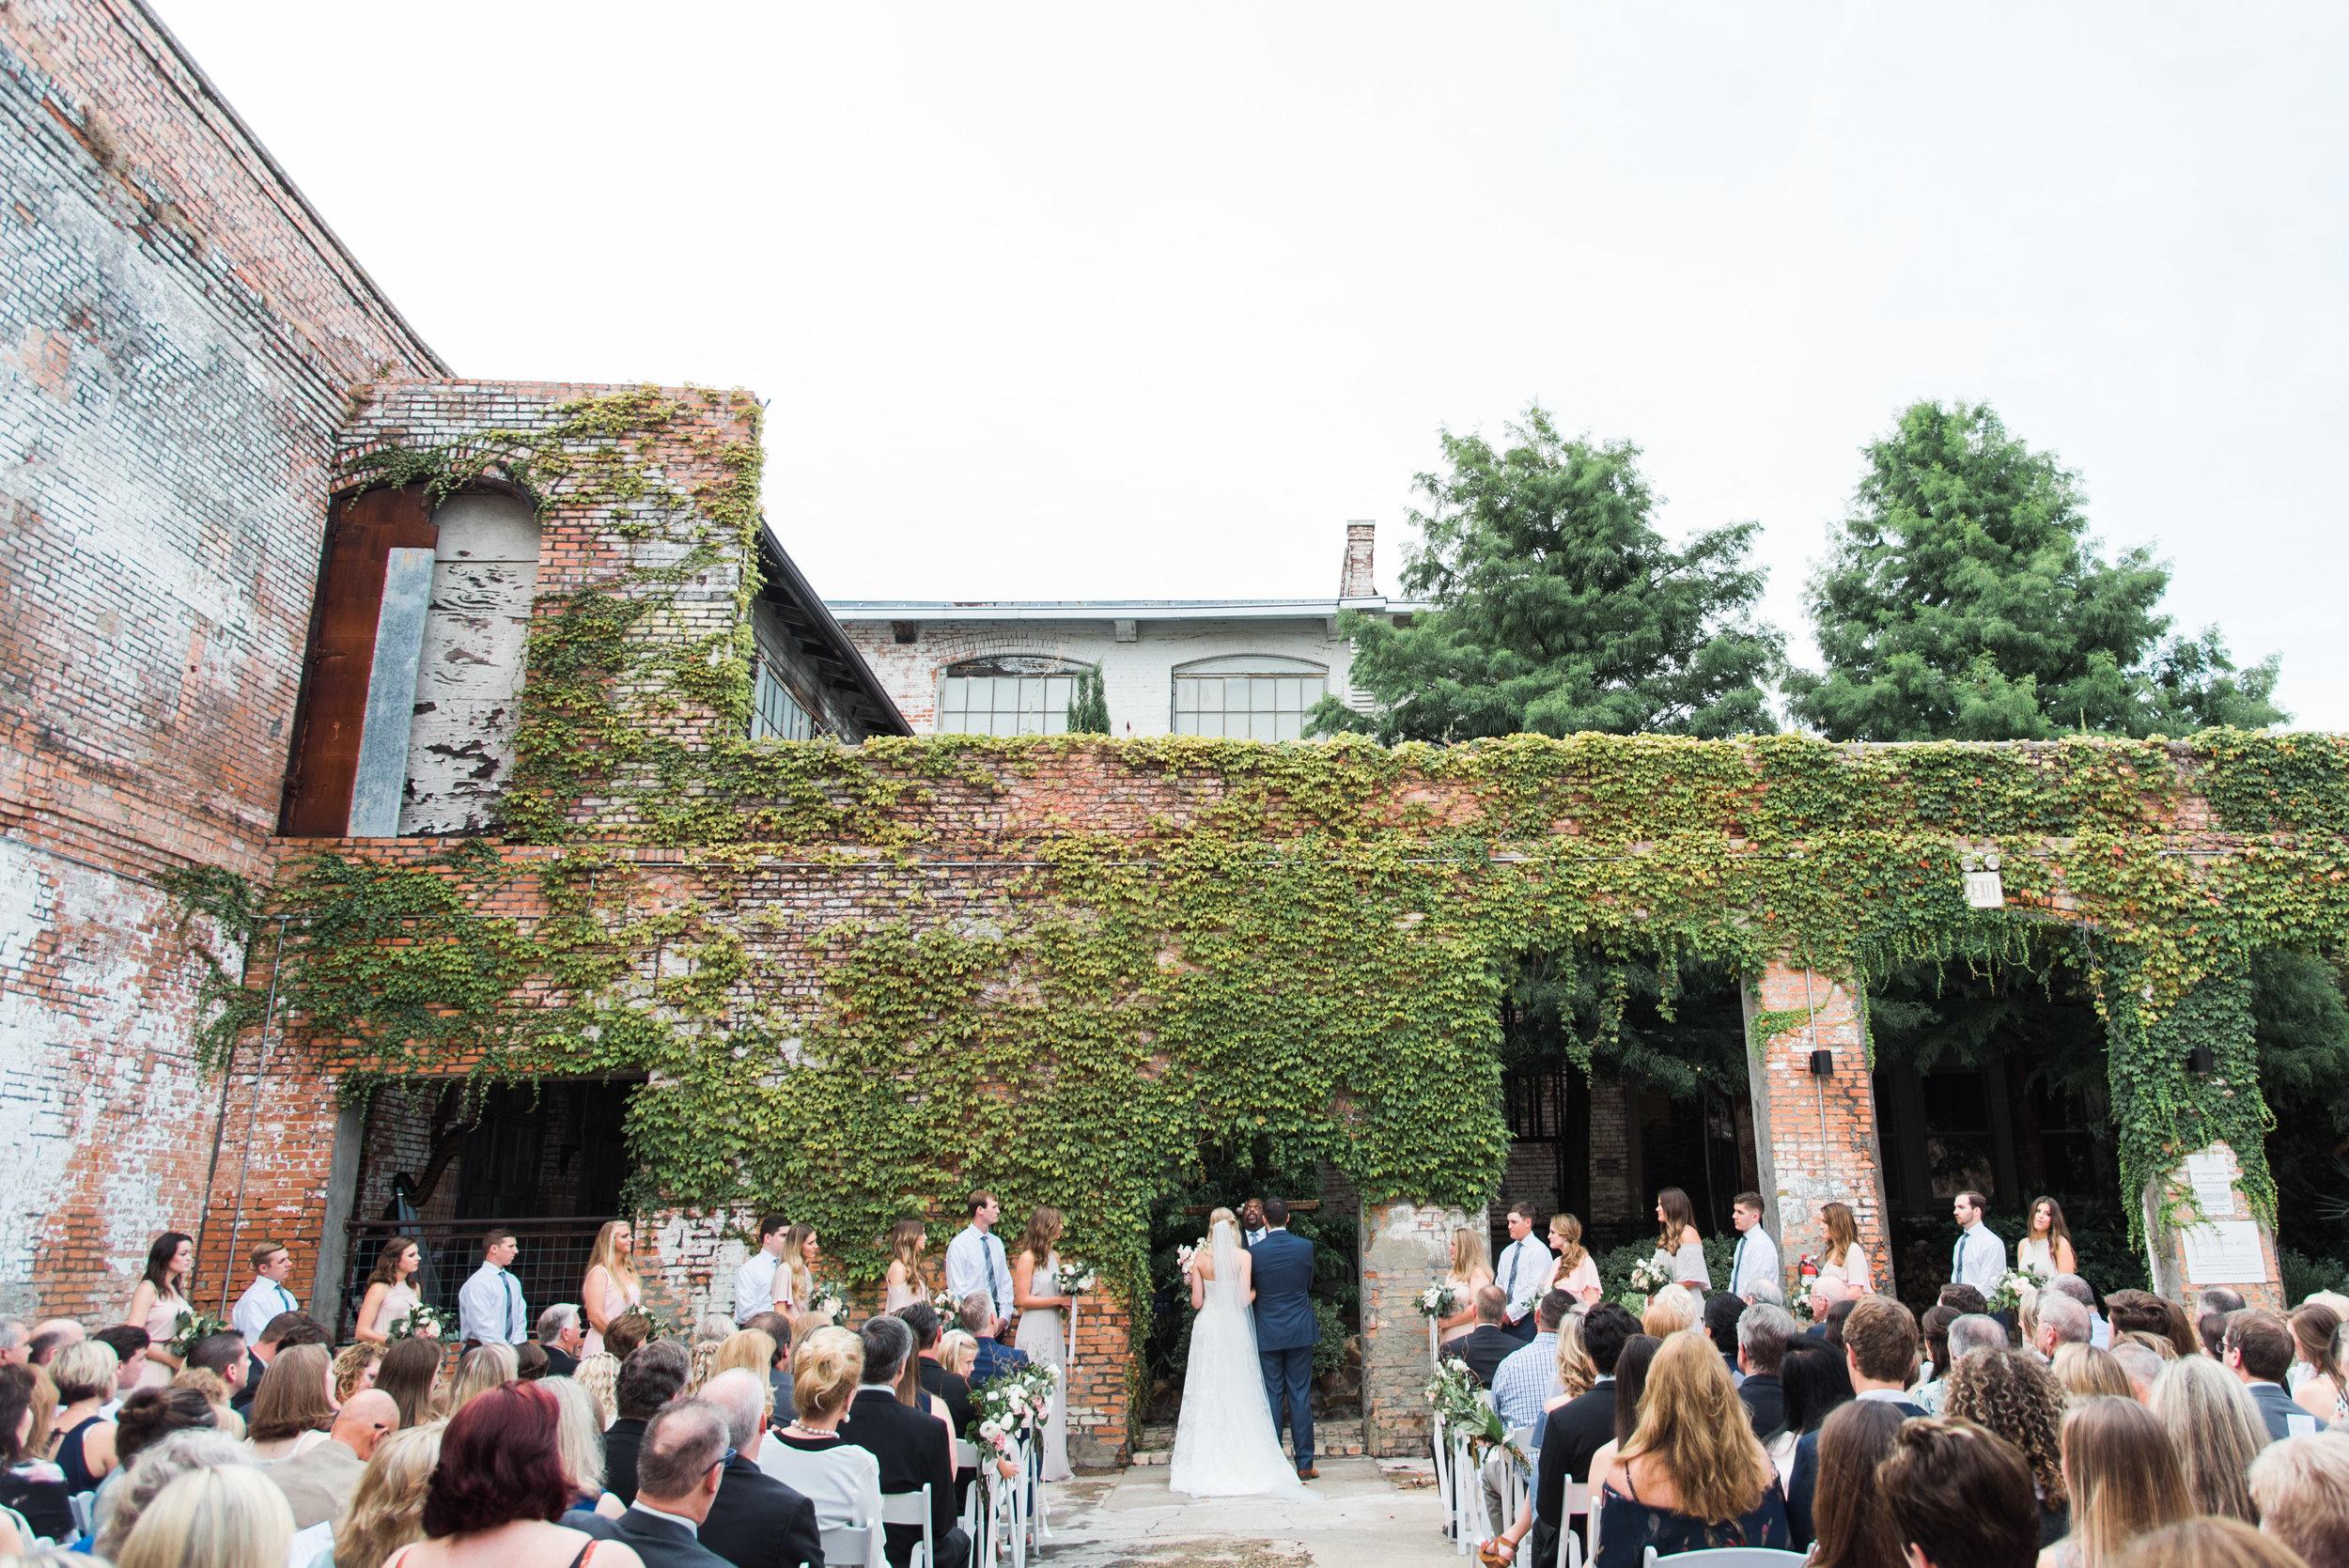 gray-door-photography-wedding-portraits-dallas-photographer-steph-erffmeyer1.jpg